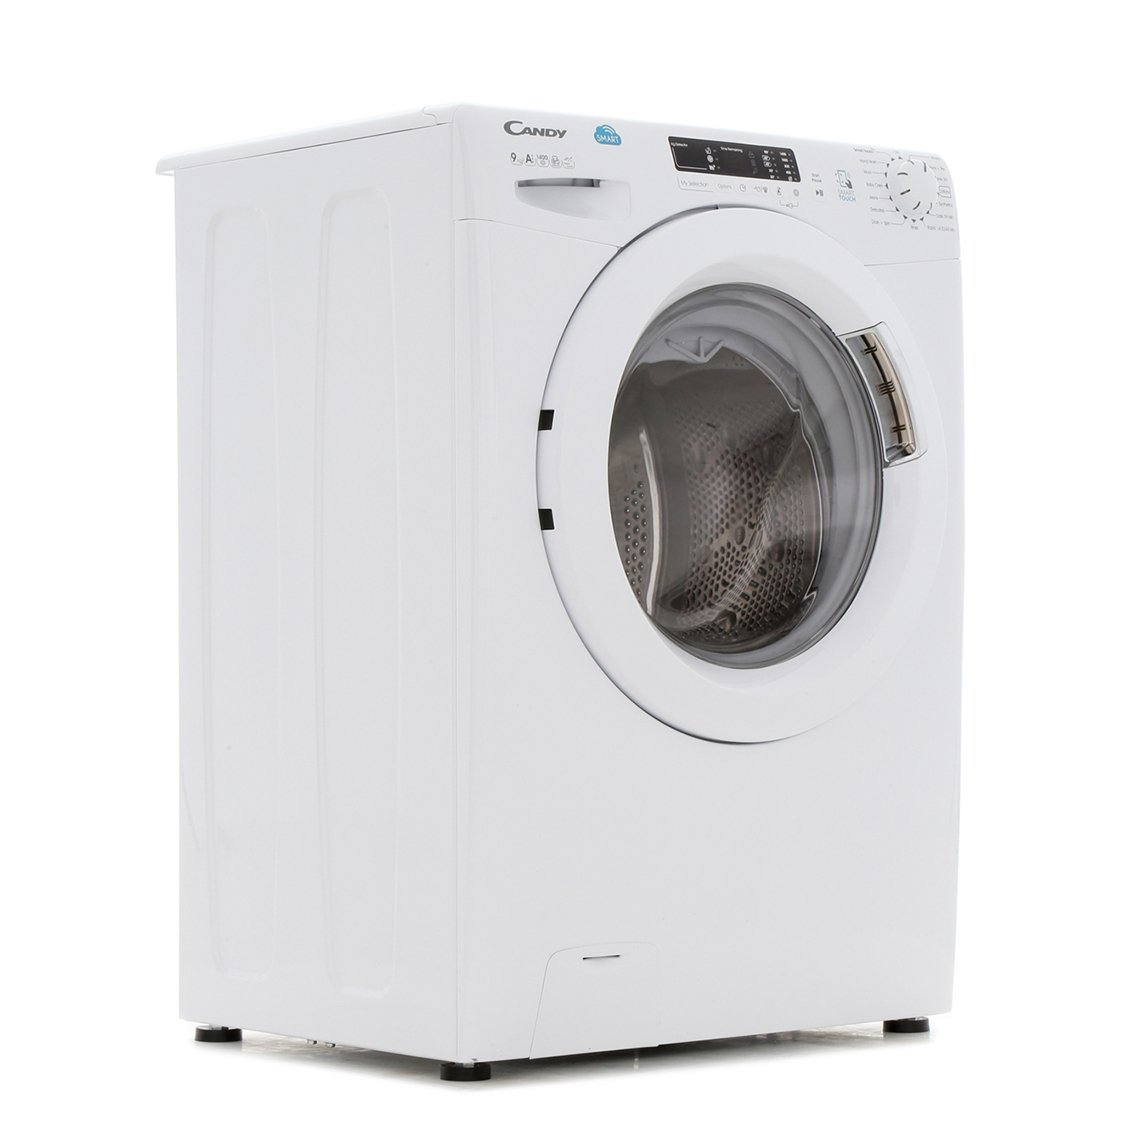 Candy CVS 1492D3 Washing Machine